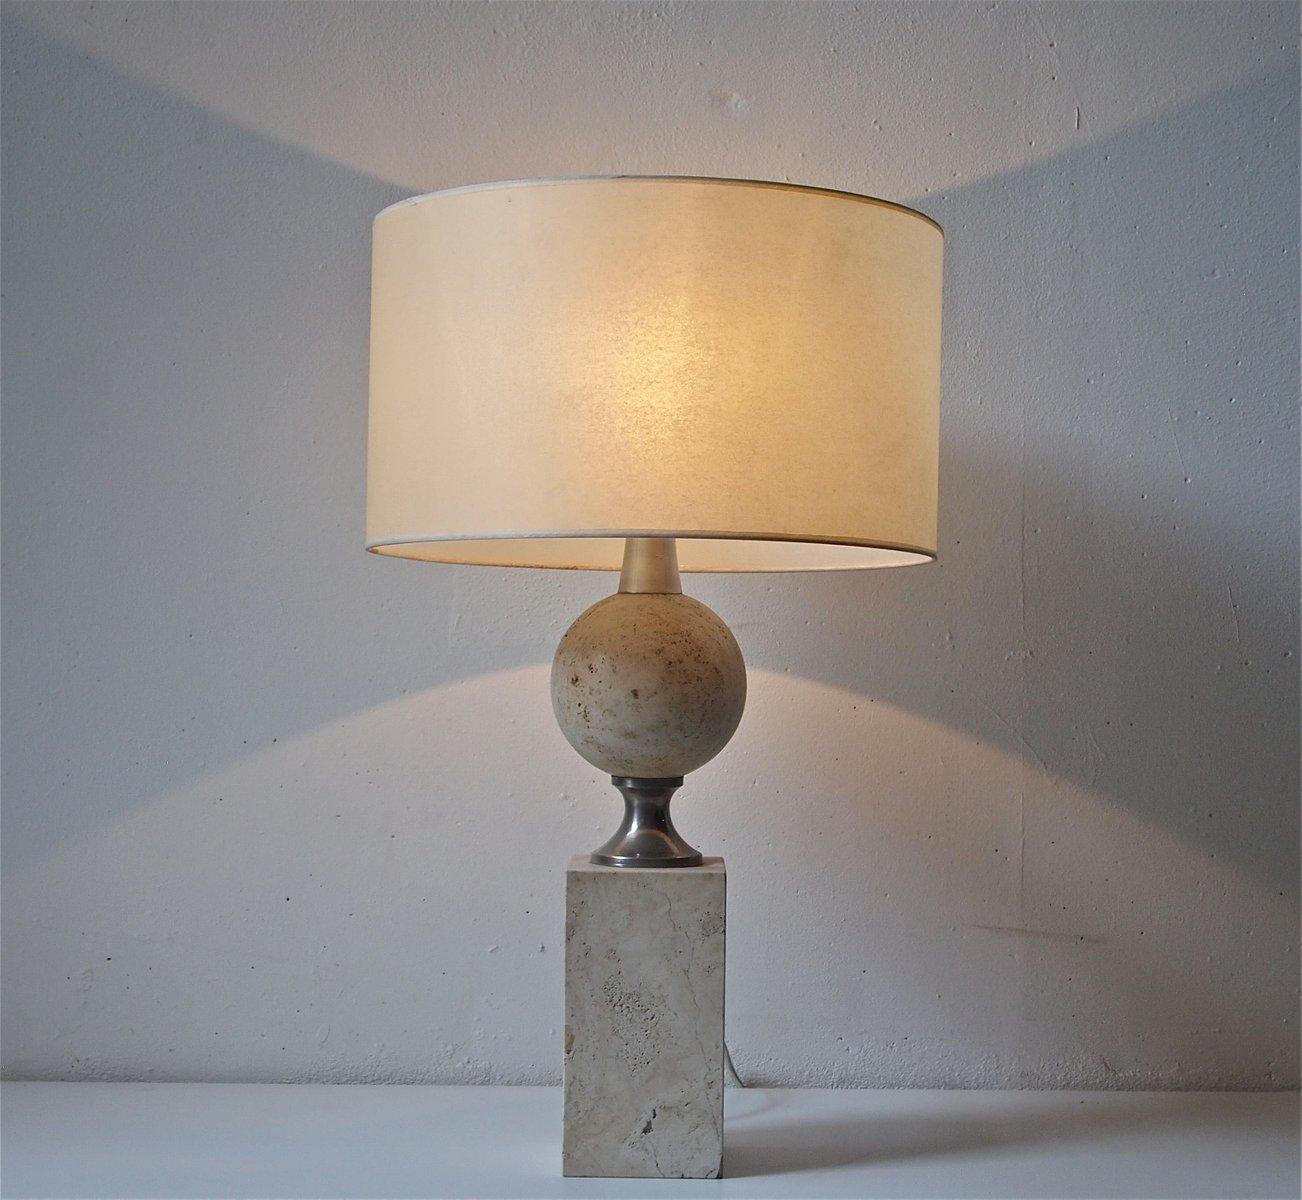 lampe mid century par pierre barbe en vente sur pamono. Black Bedroom Furniture Sets. Home Design Ideas